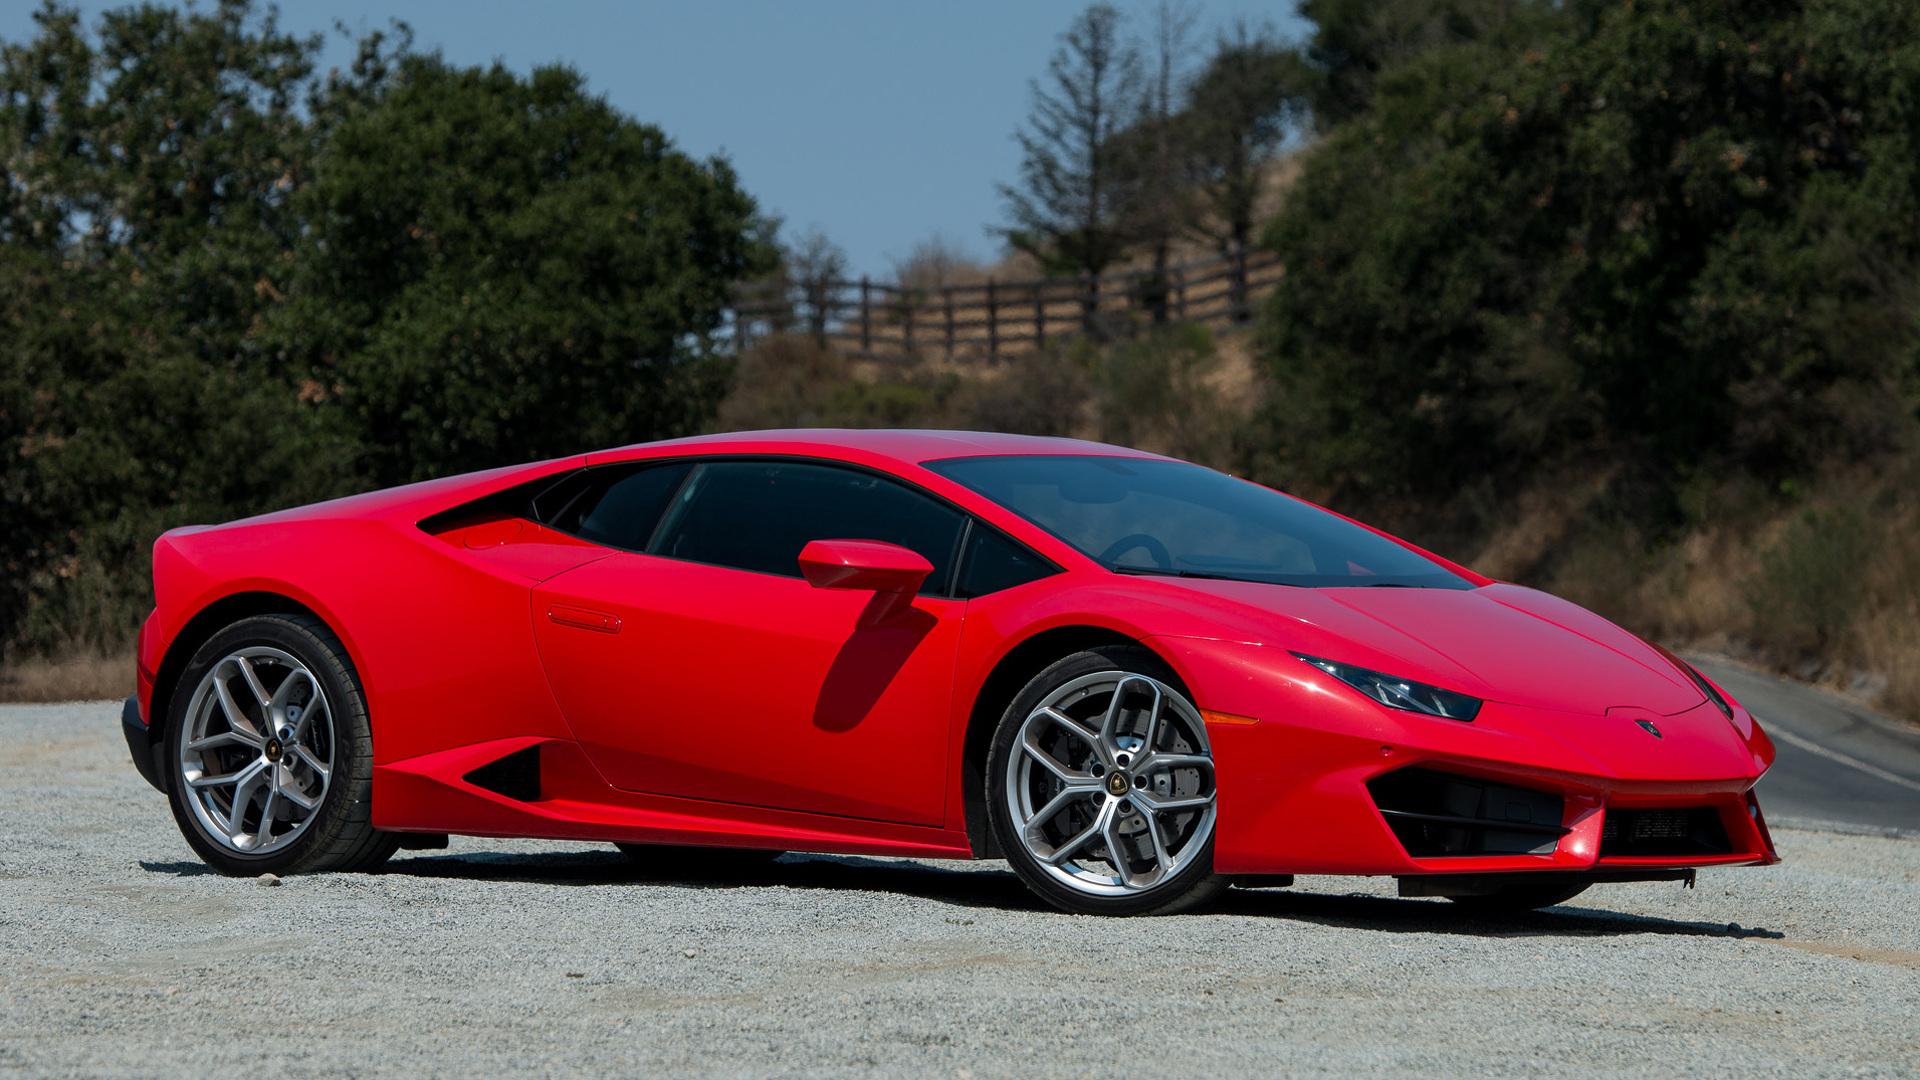 First Drive: 2016 Lamborghini Huracán LP 580-2